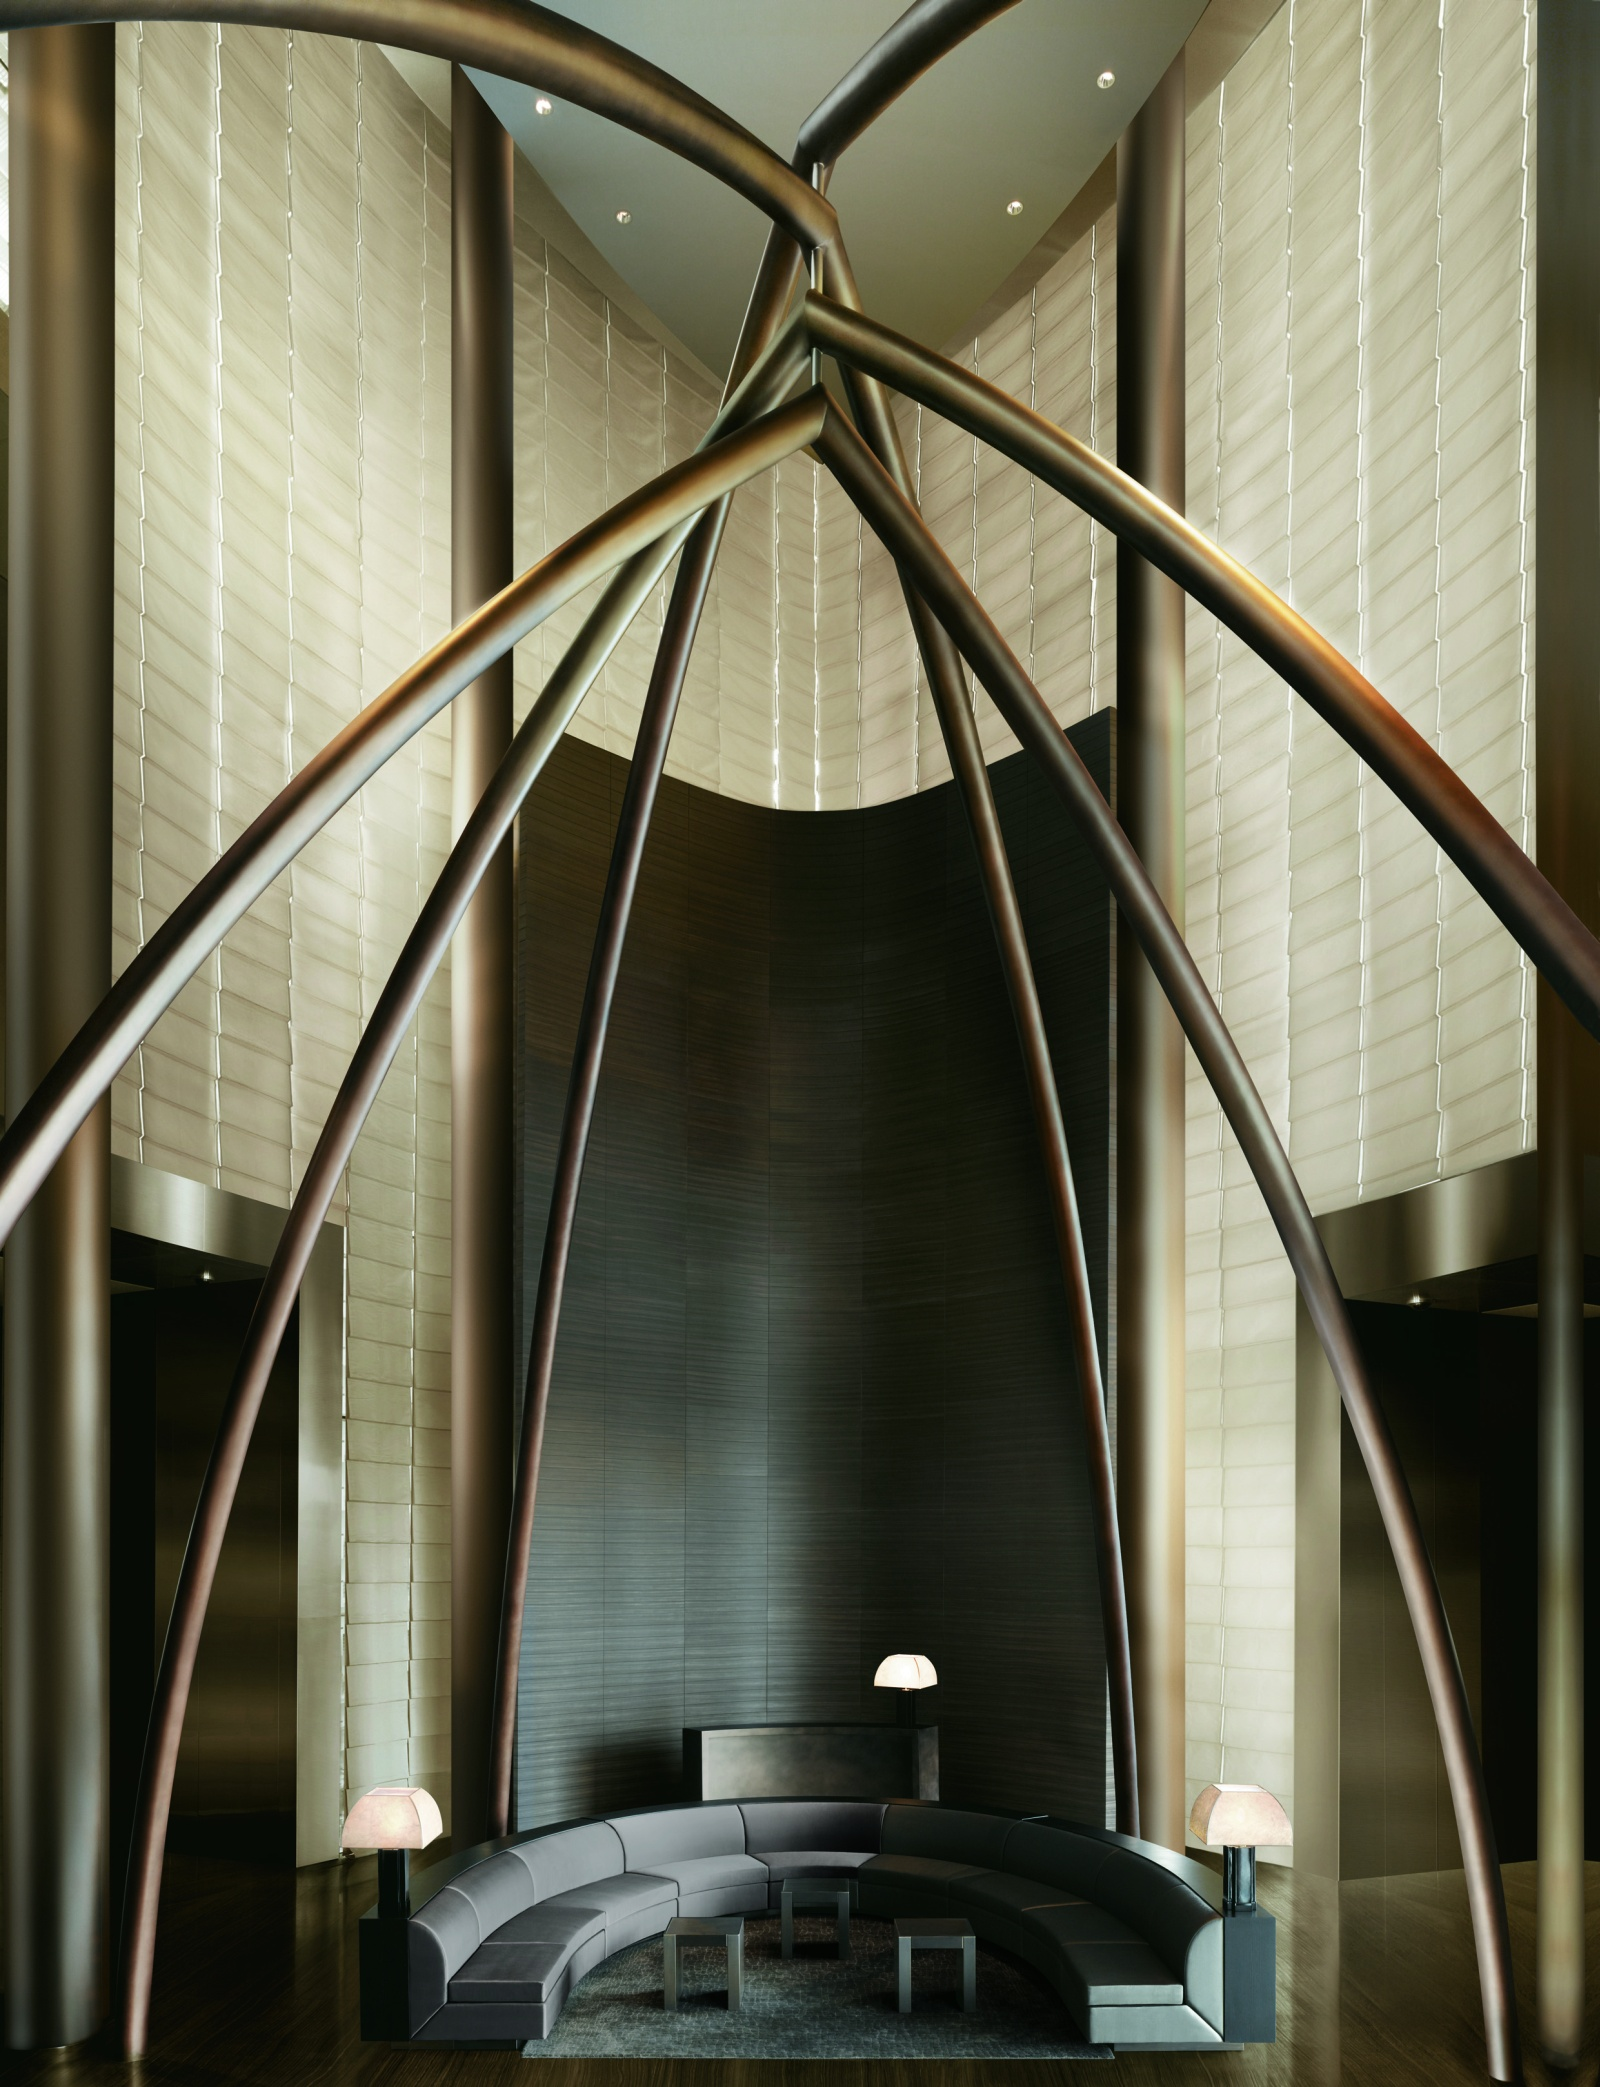 Armani hotel dubai Armani hotel in burj khalifa